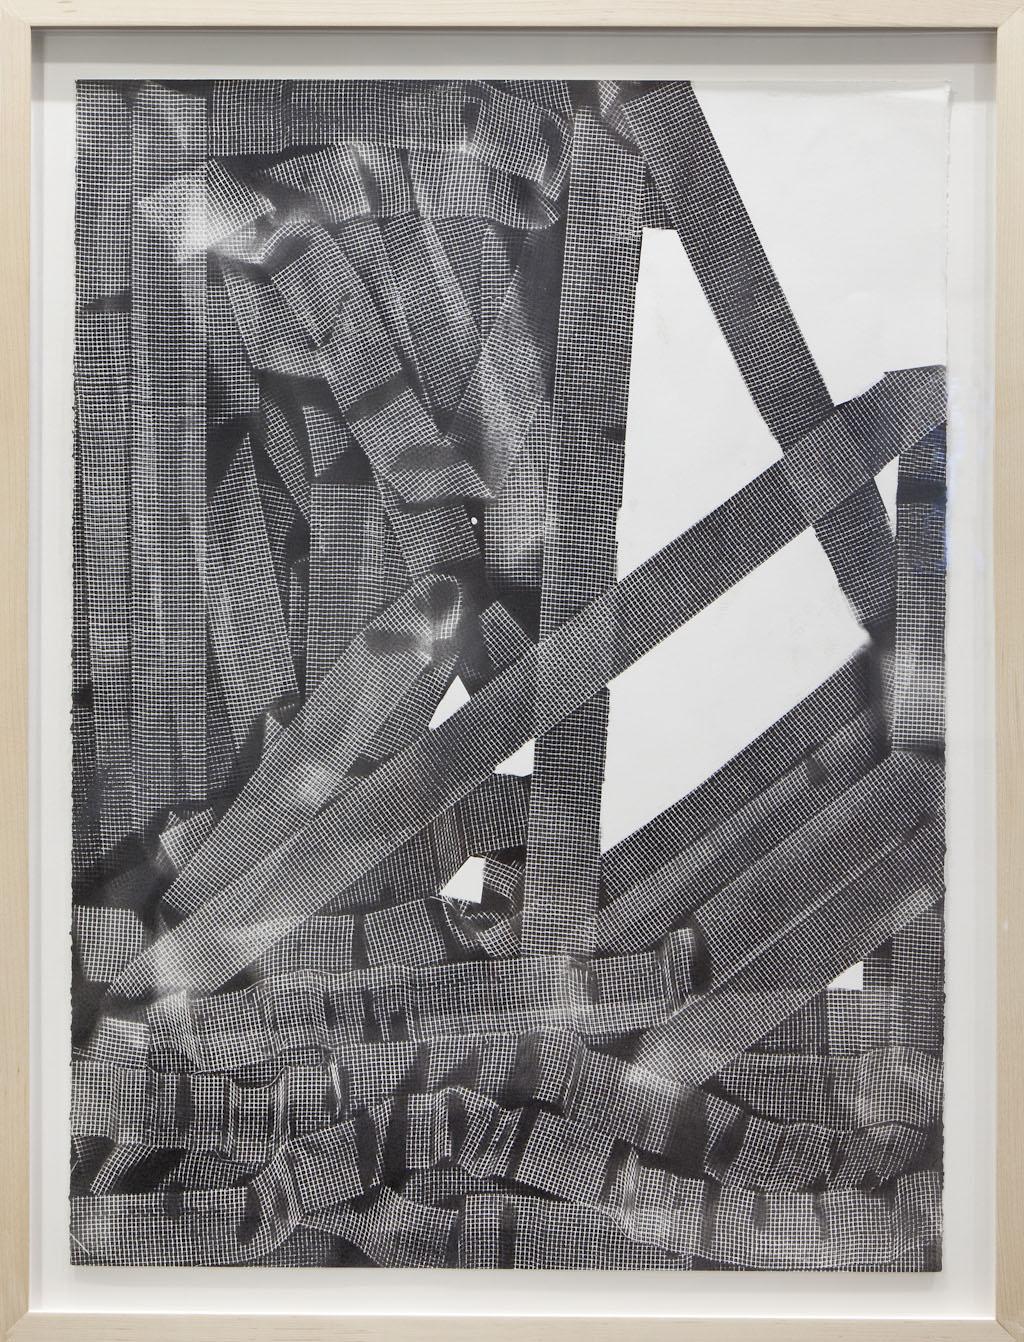 "10 Minute Drawings,  paint on paper, Ten drawings each 30"" H X 22.5"" W,  2011"